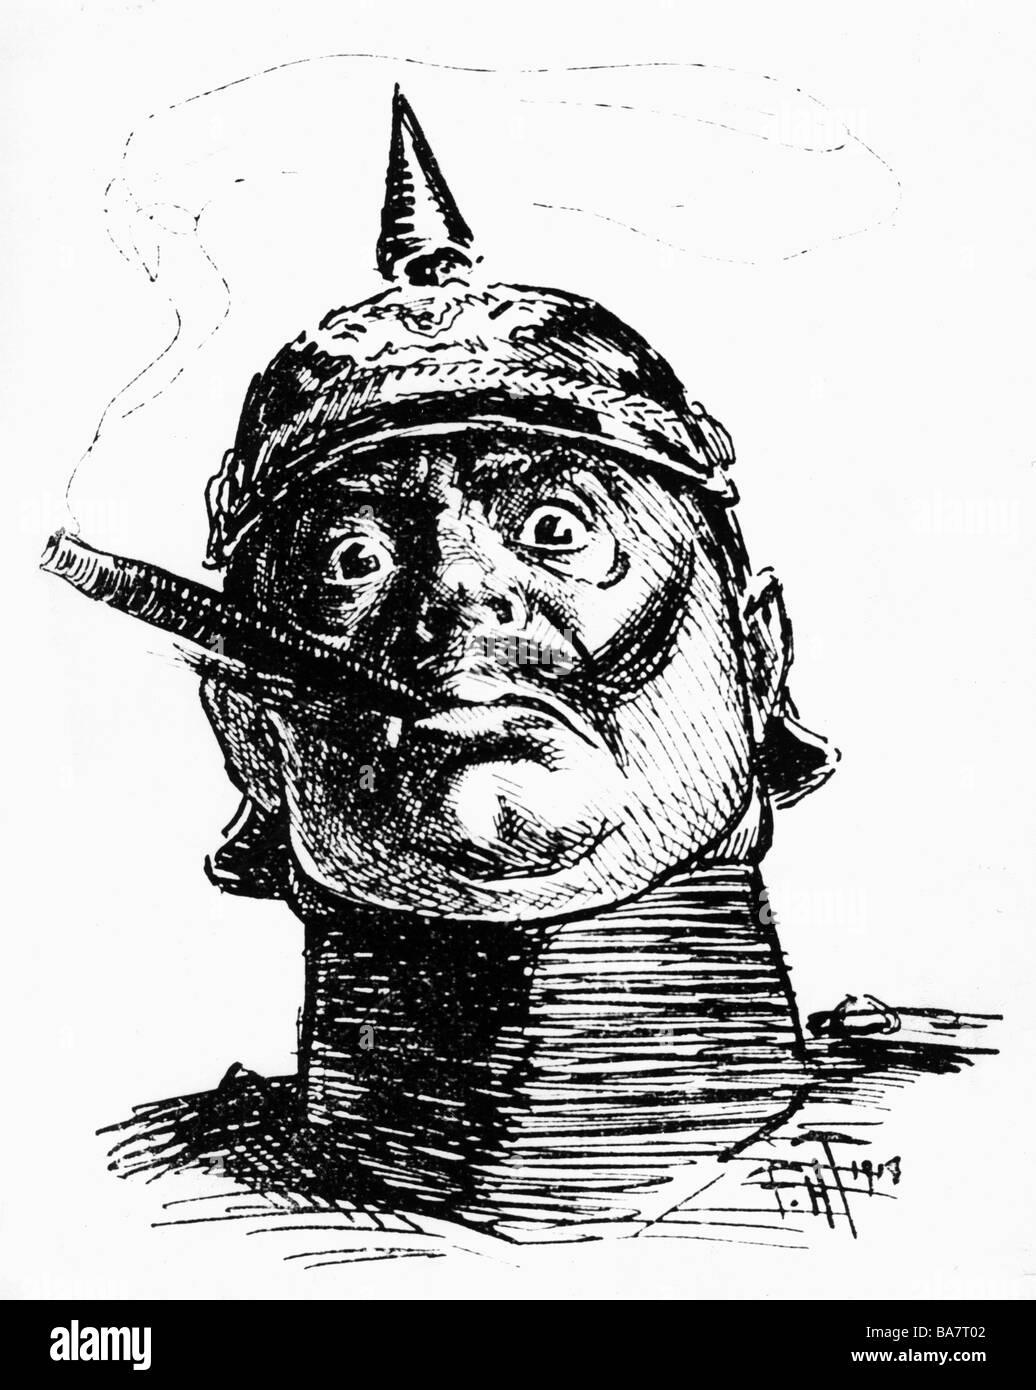 William II, 27.1.1859 - 4.6.1941, German Emperor 15.6.1888 - 9.11.1918, portrait, caricatur, 'Punch', Great - Stock Image